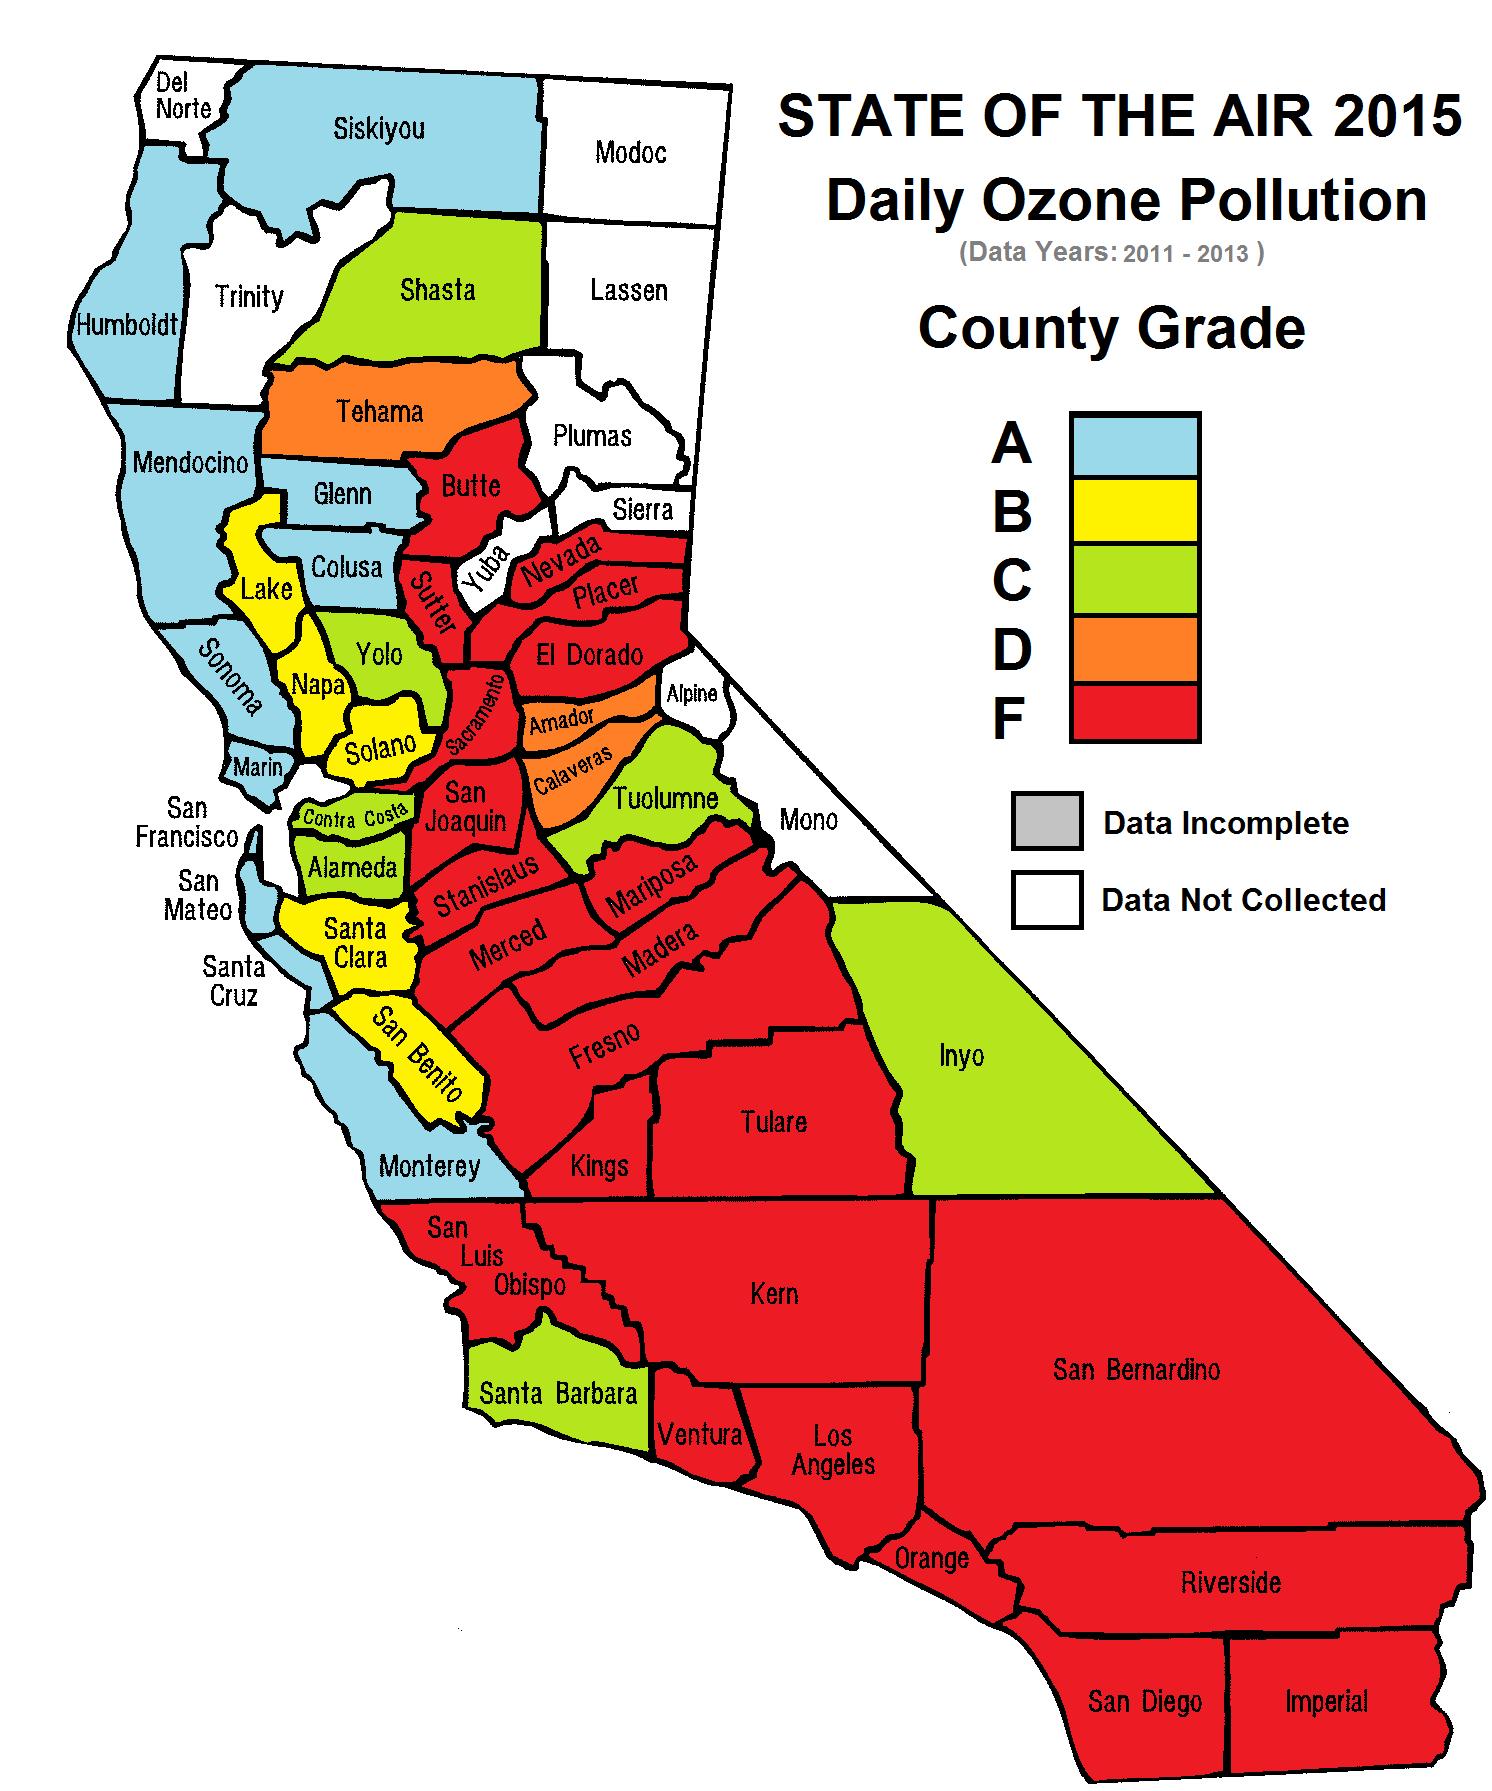 Stateofairmap Map California Air Quality Map California - Klipy - Air Quality Map For California